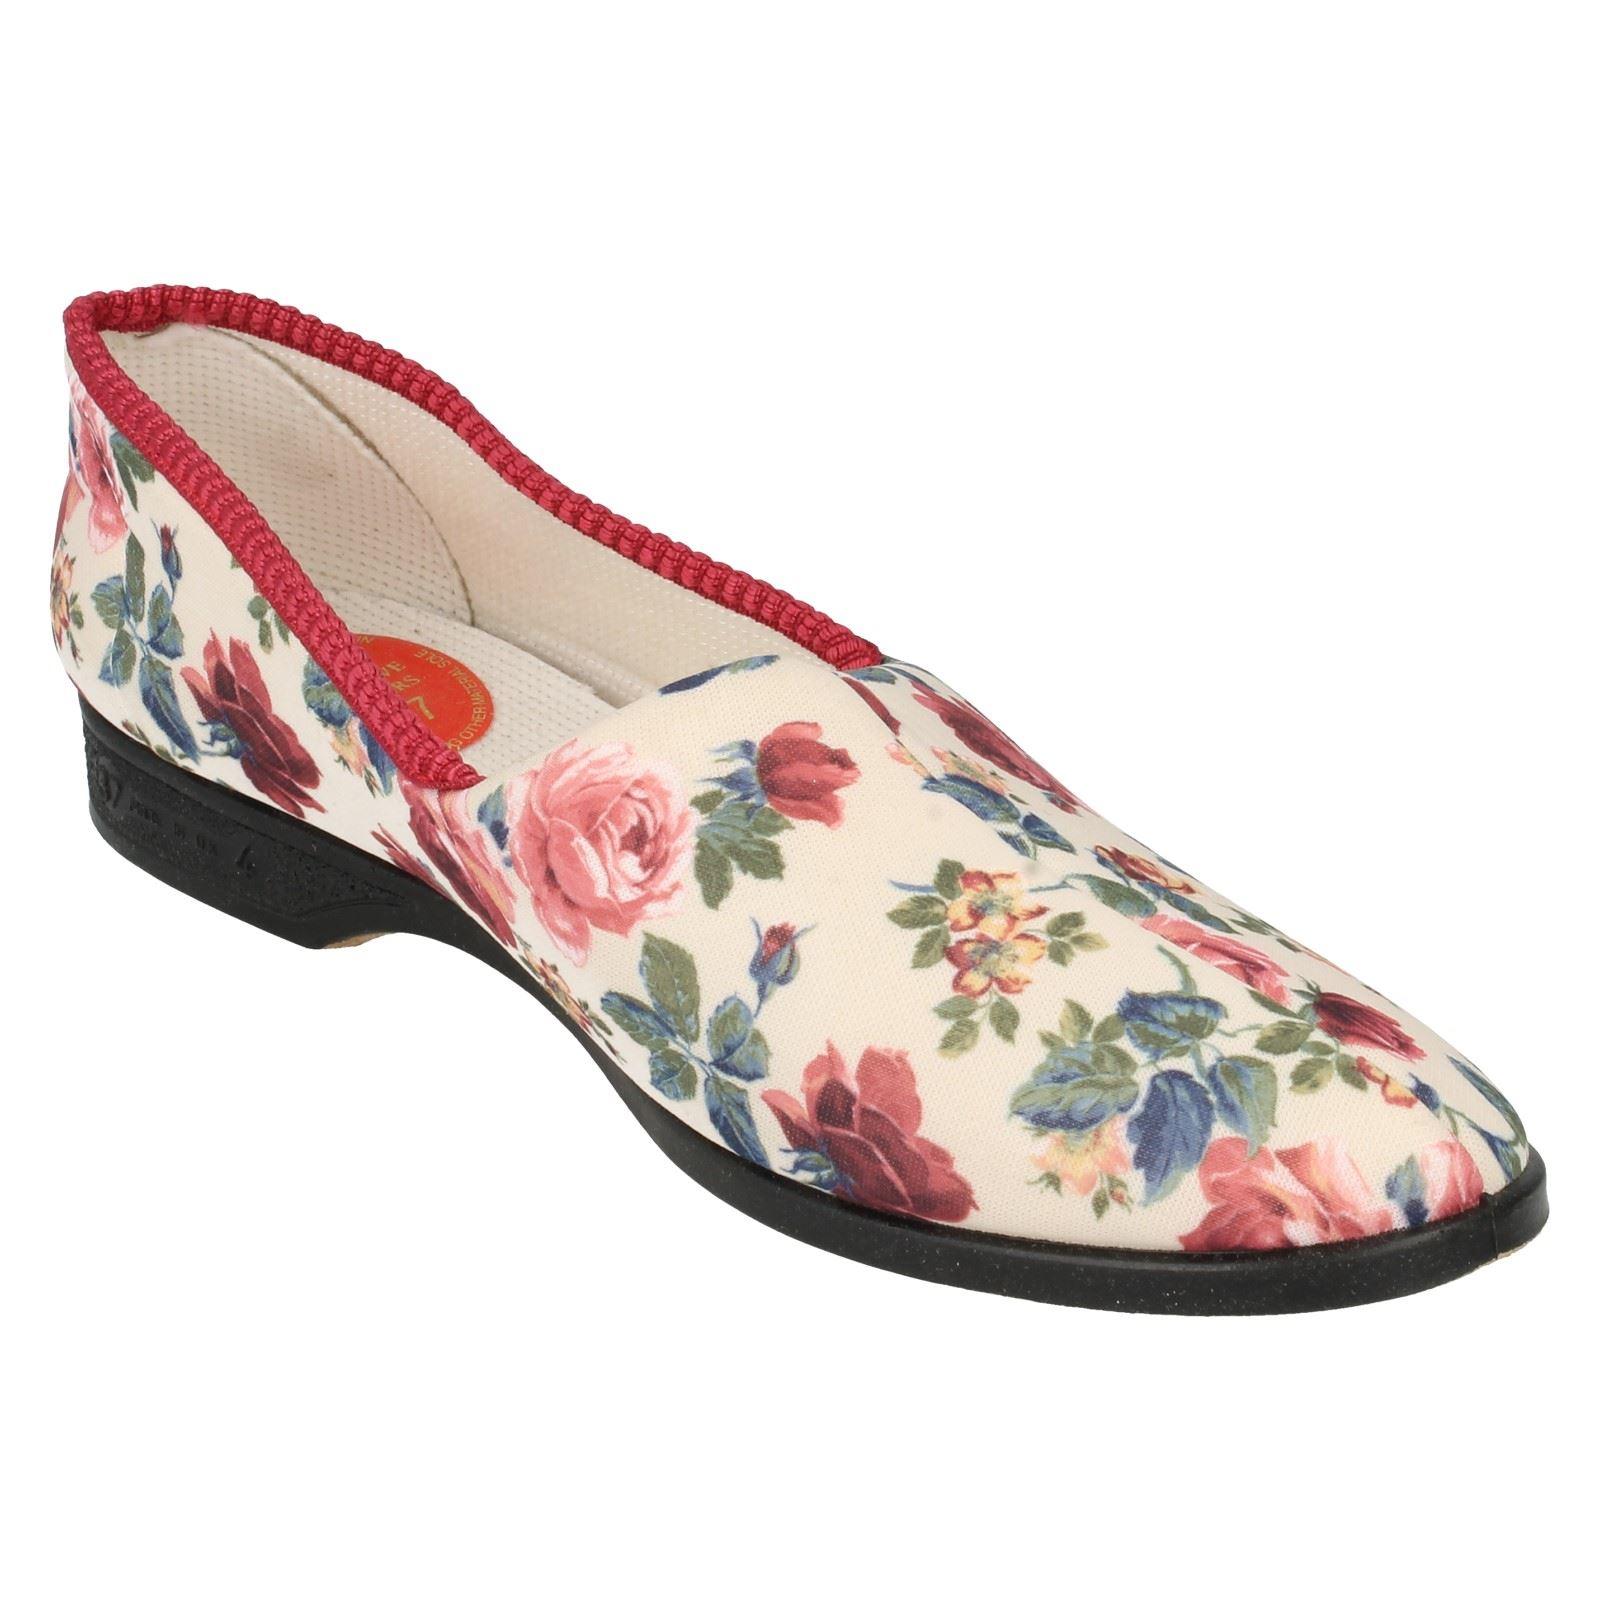 Señoras ladylove Floral Zapatillas Etiqueta Garden Print